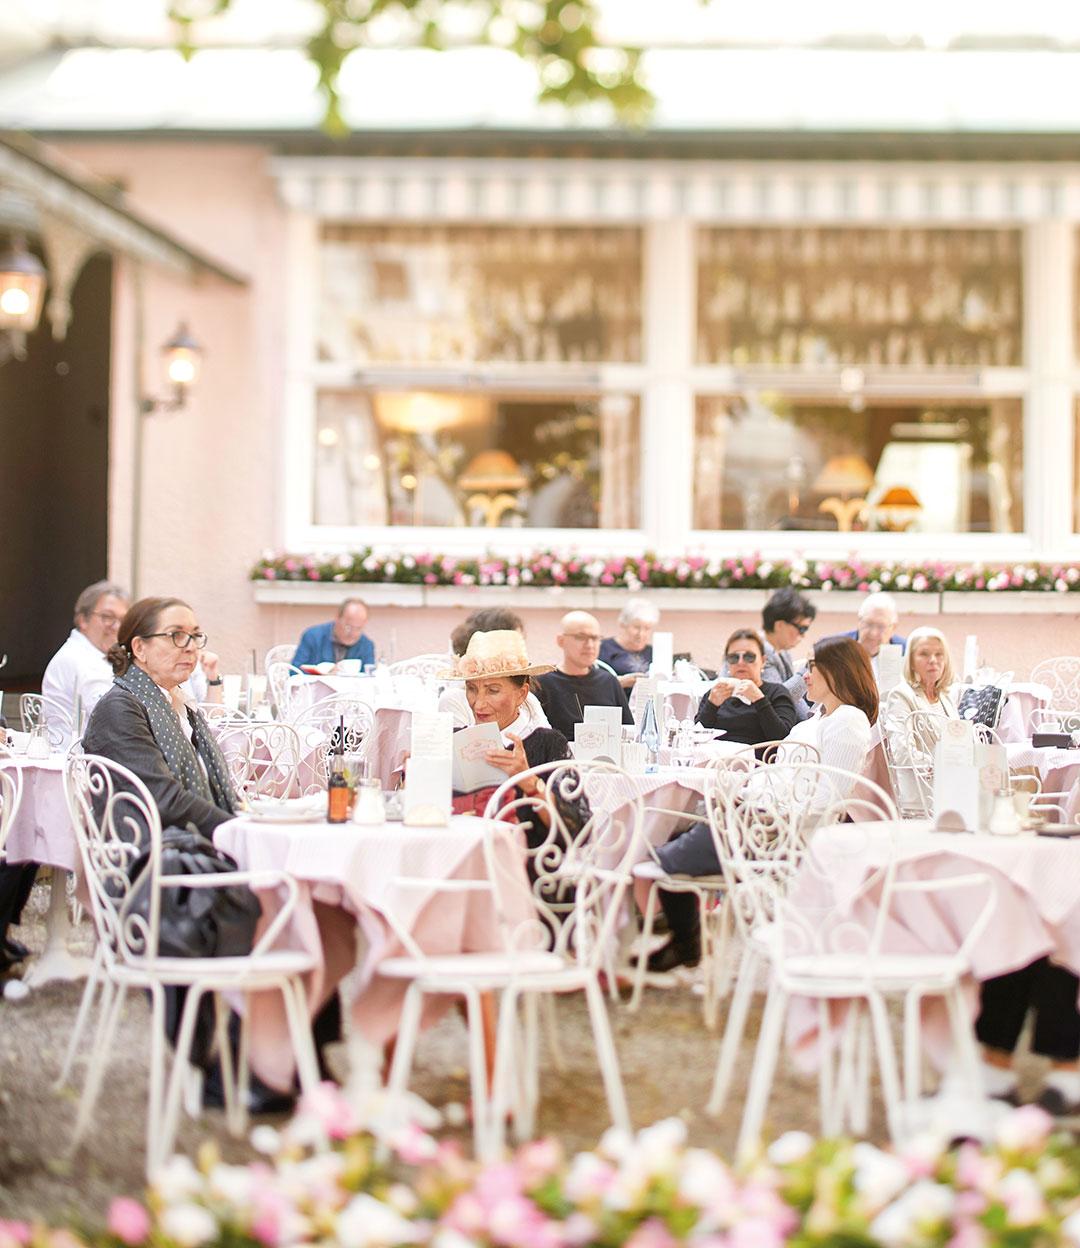 ZUT-MAGAZINE Terrasse du Café König à Baden-Baden ©Alexis-Delon/Preview